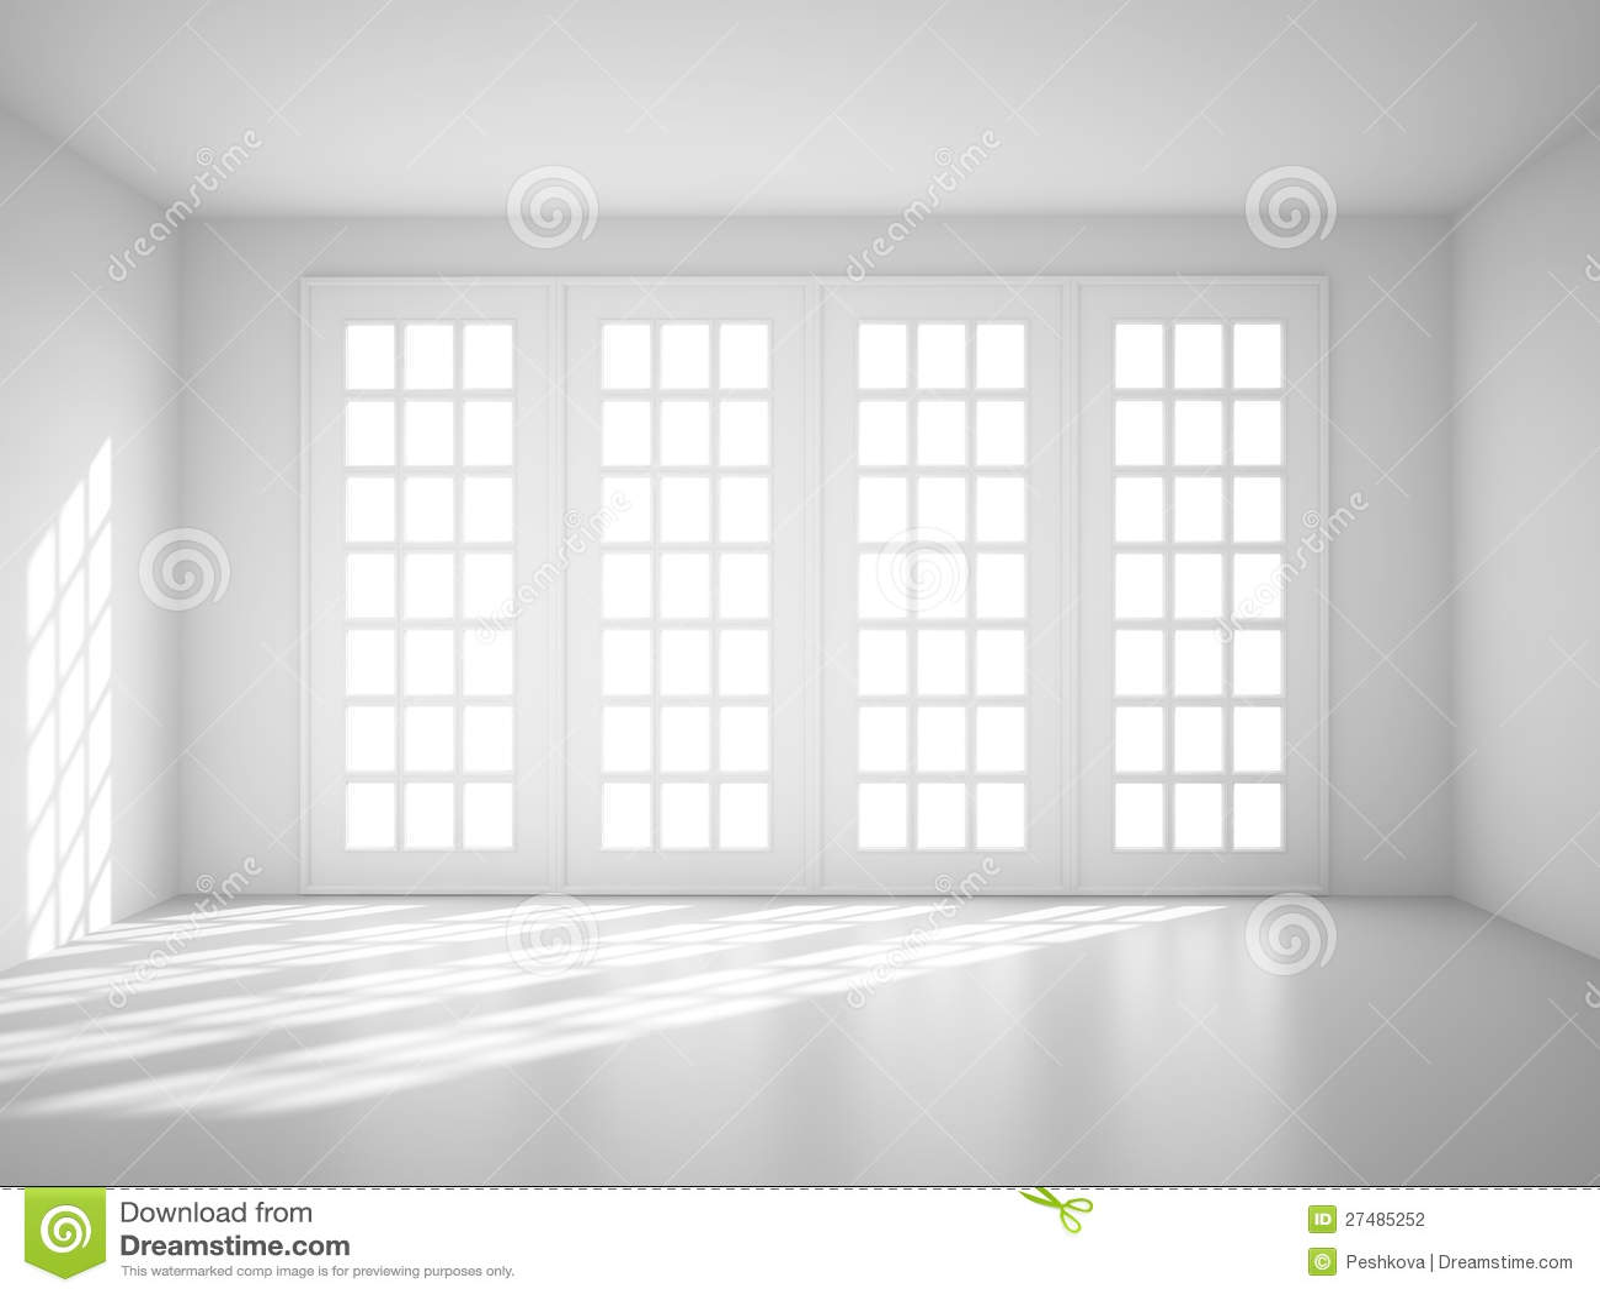 Big white room.